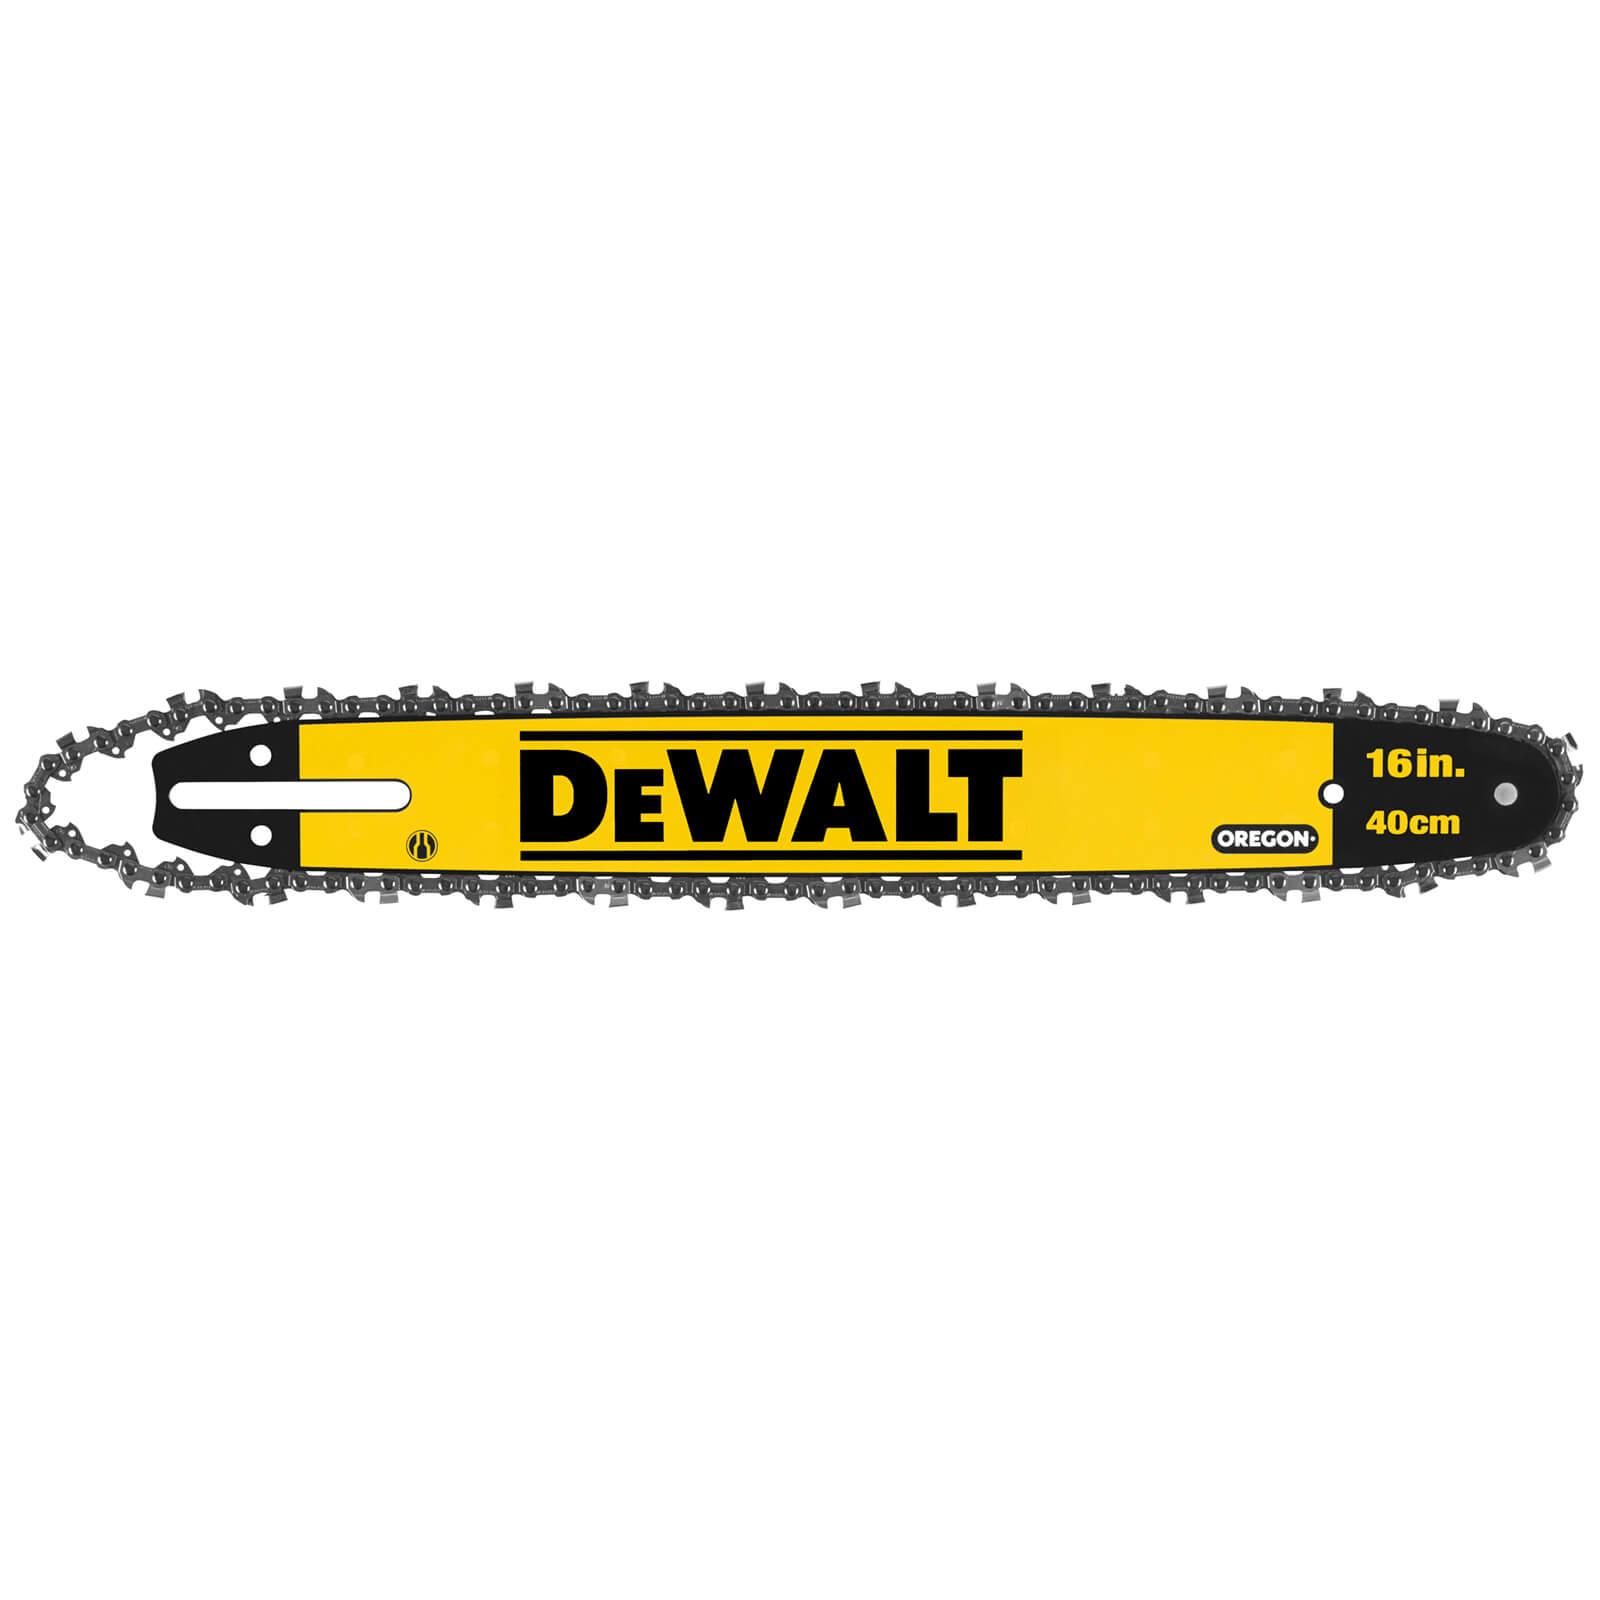 DeWalt Chainsaw Bar and Chain for DCM575 400mm